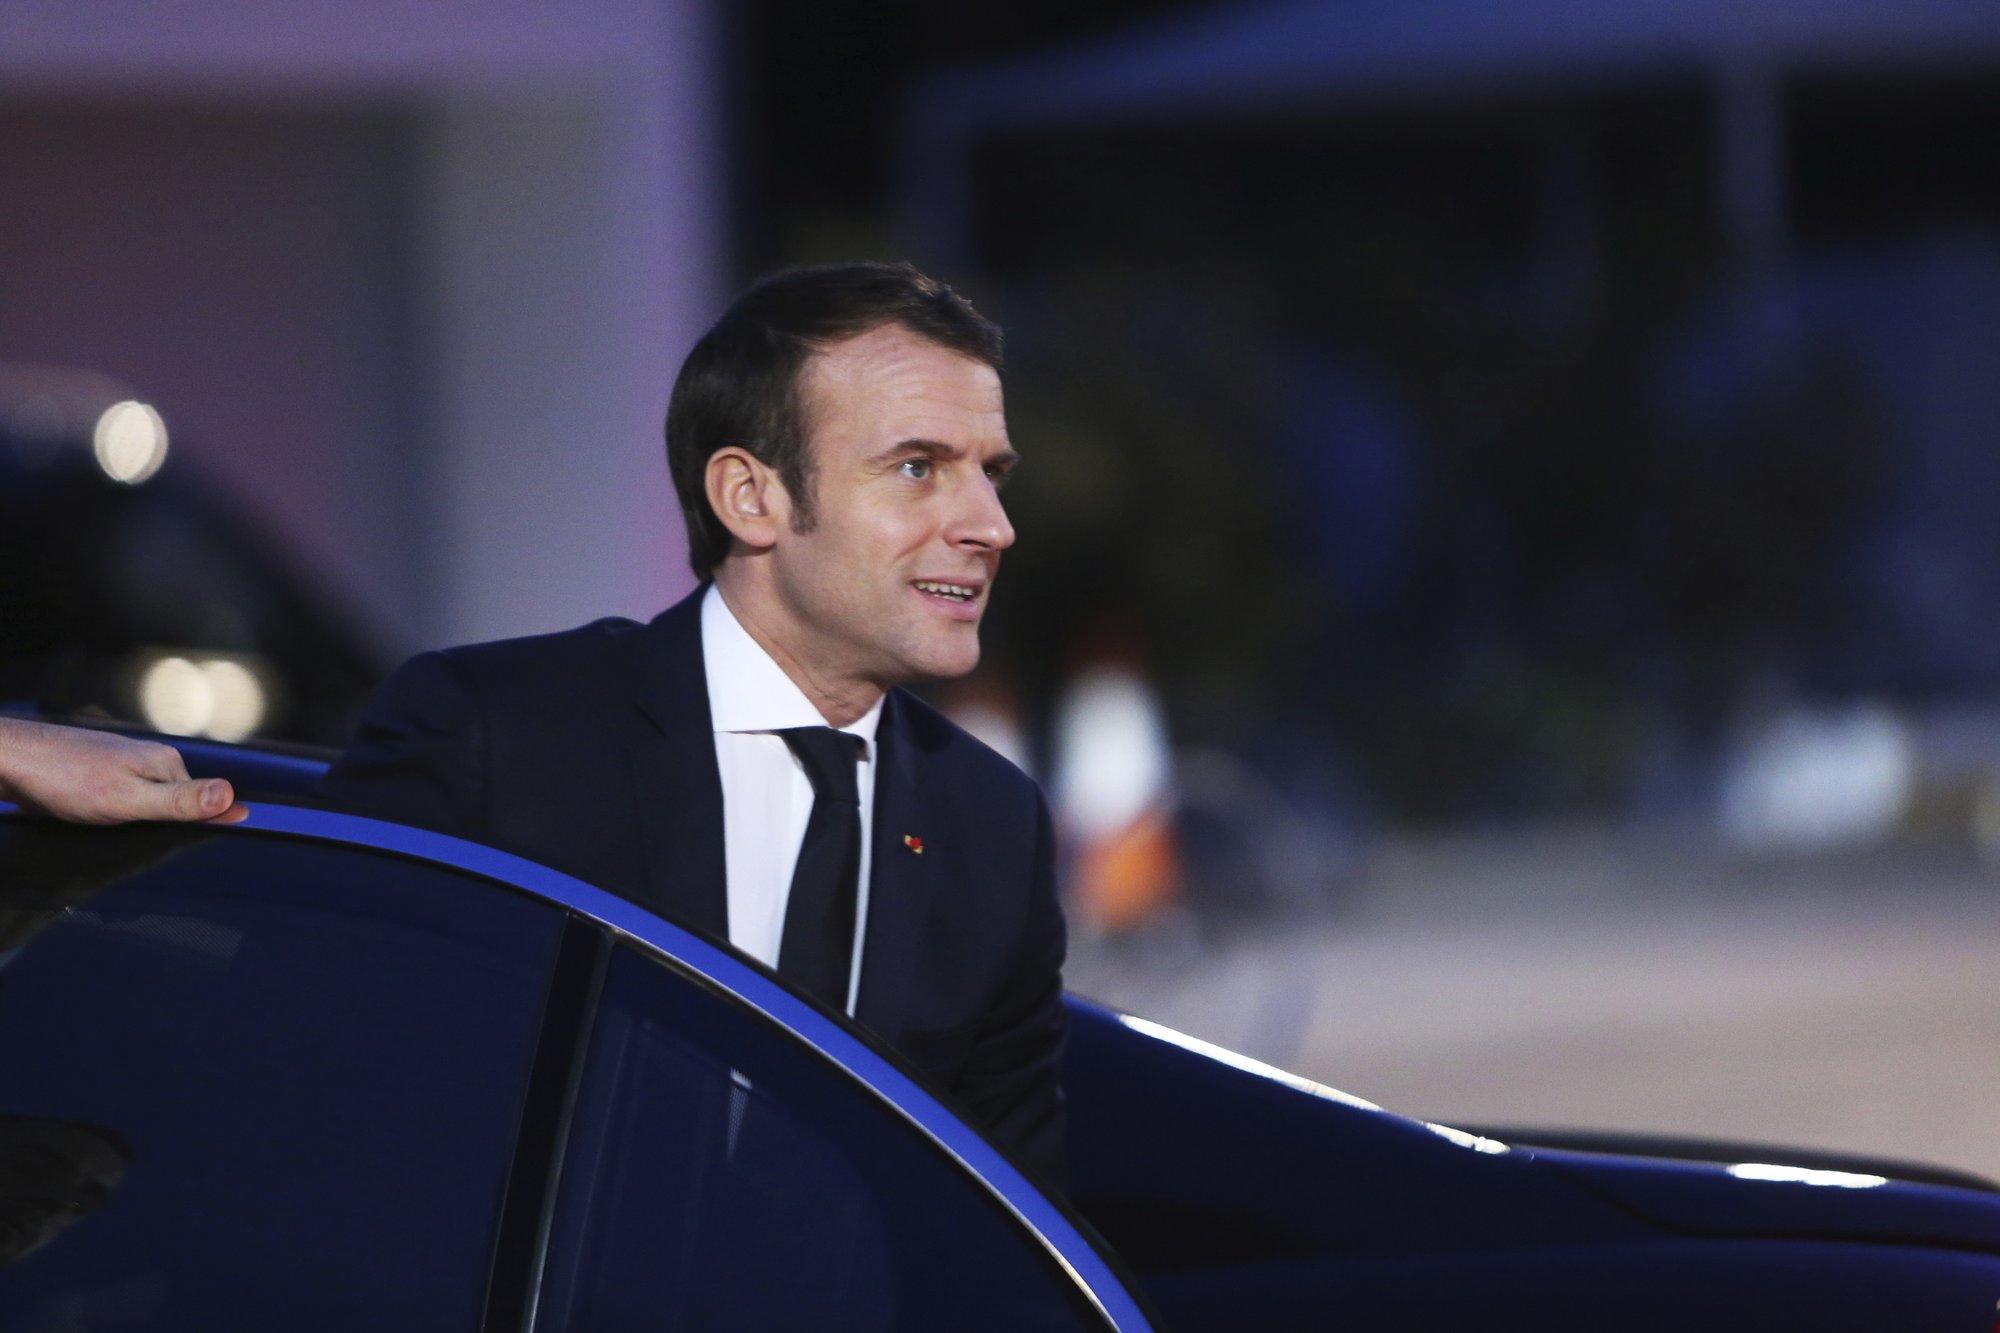 Macron pledges to respond to 'Yellow Vest' movement soon